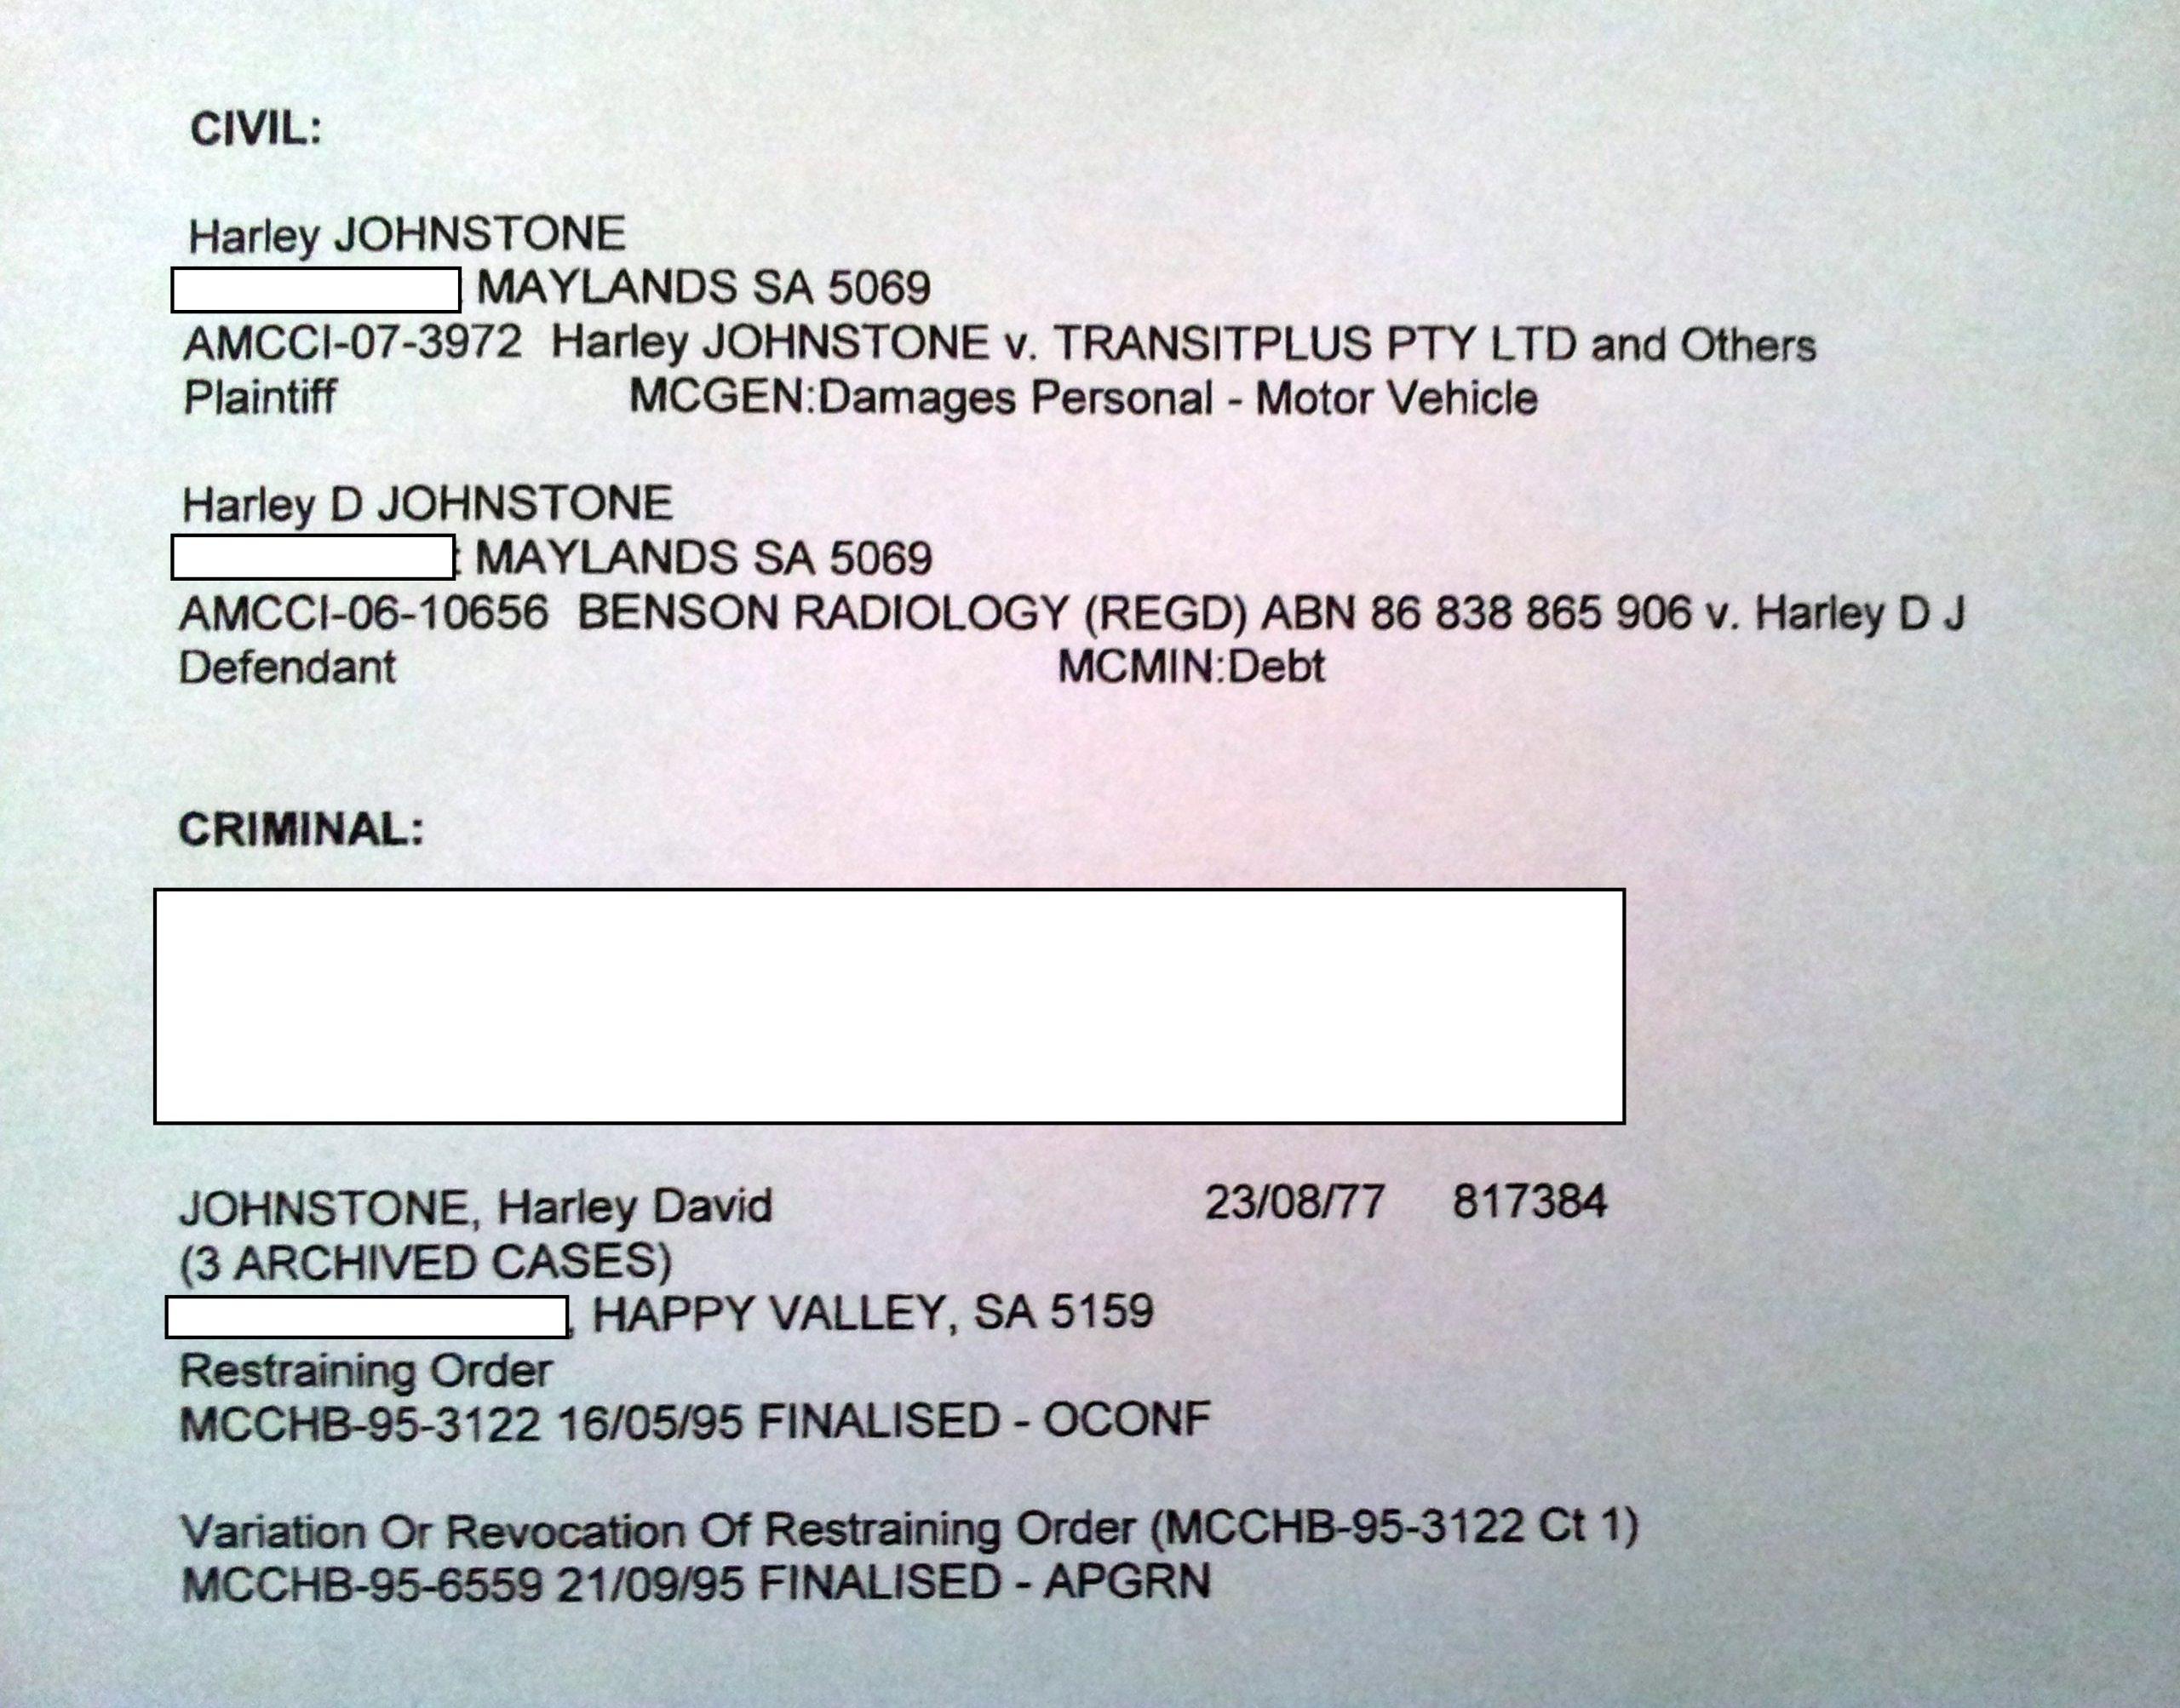 harley-durianrider-johnstone-criminal-record-2-redacted